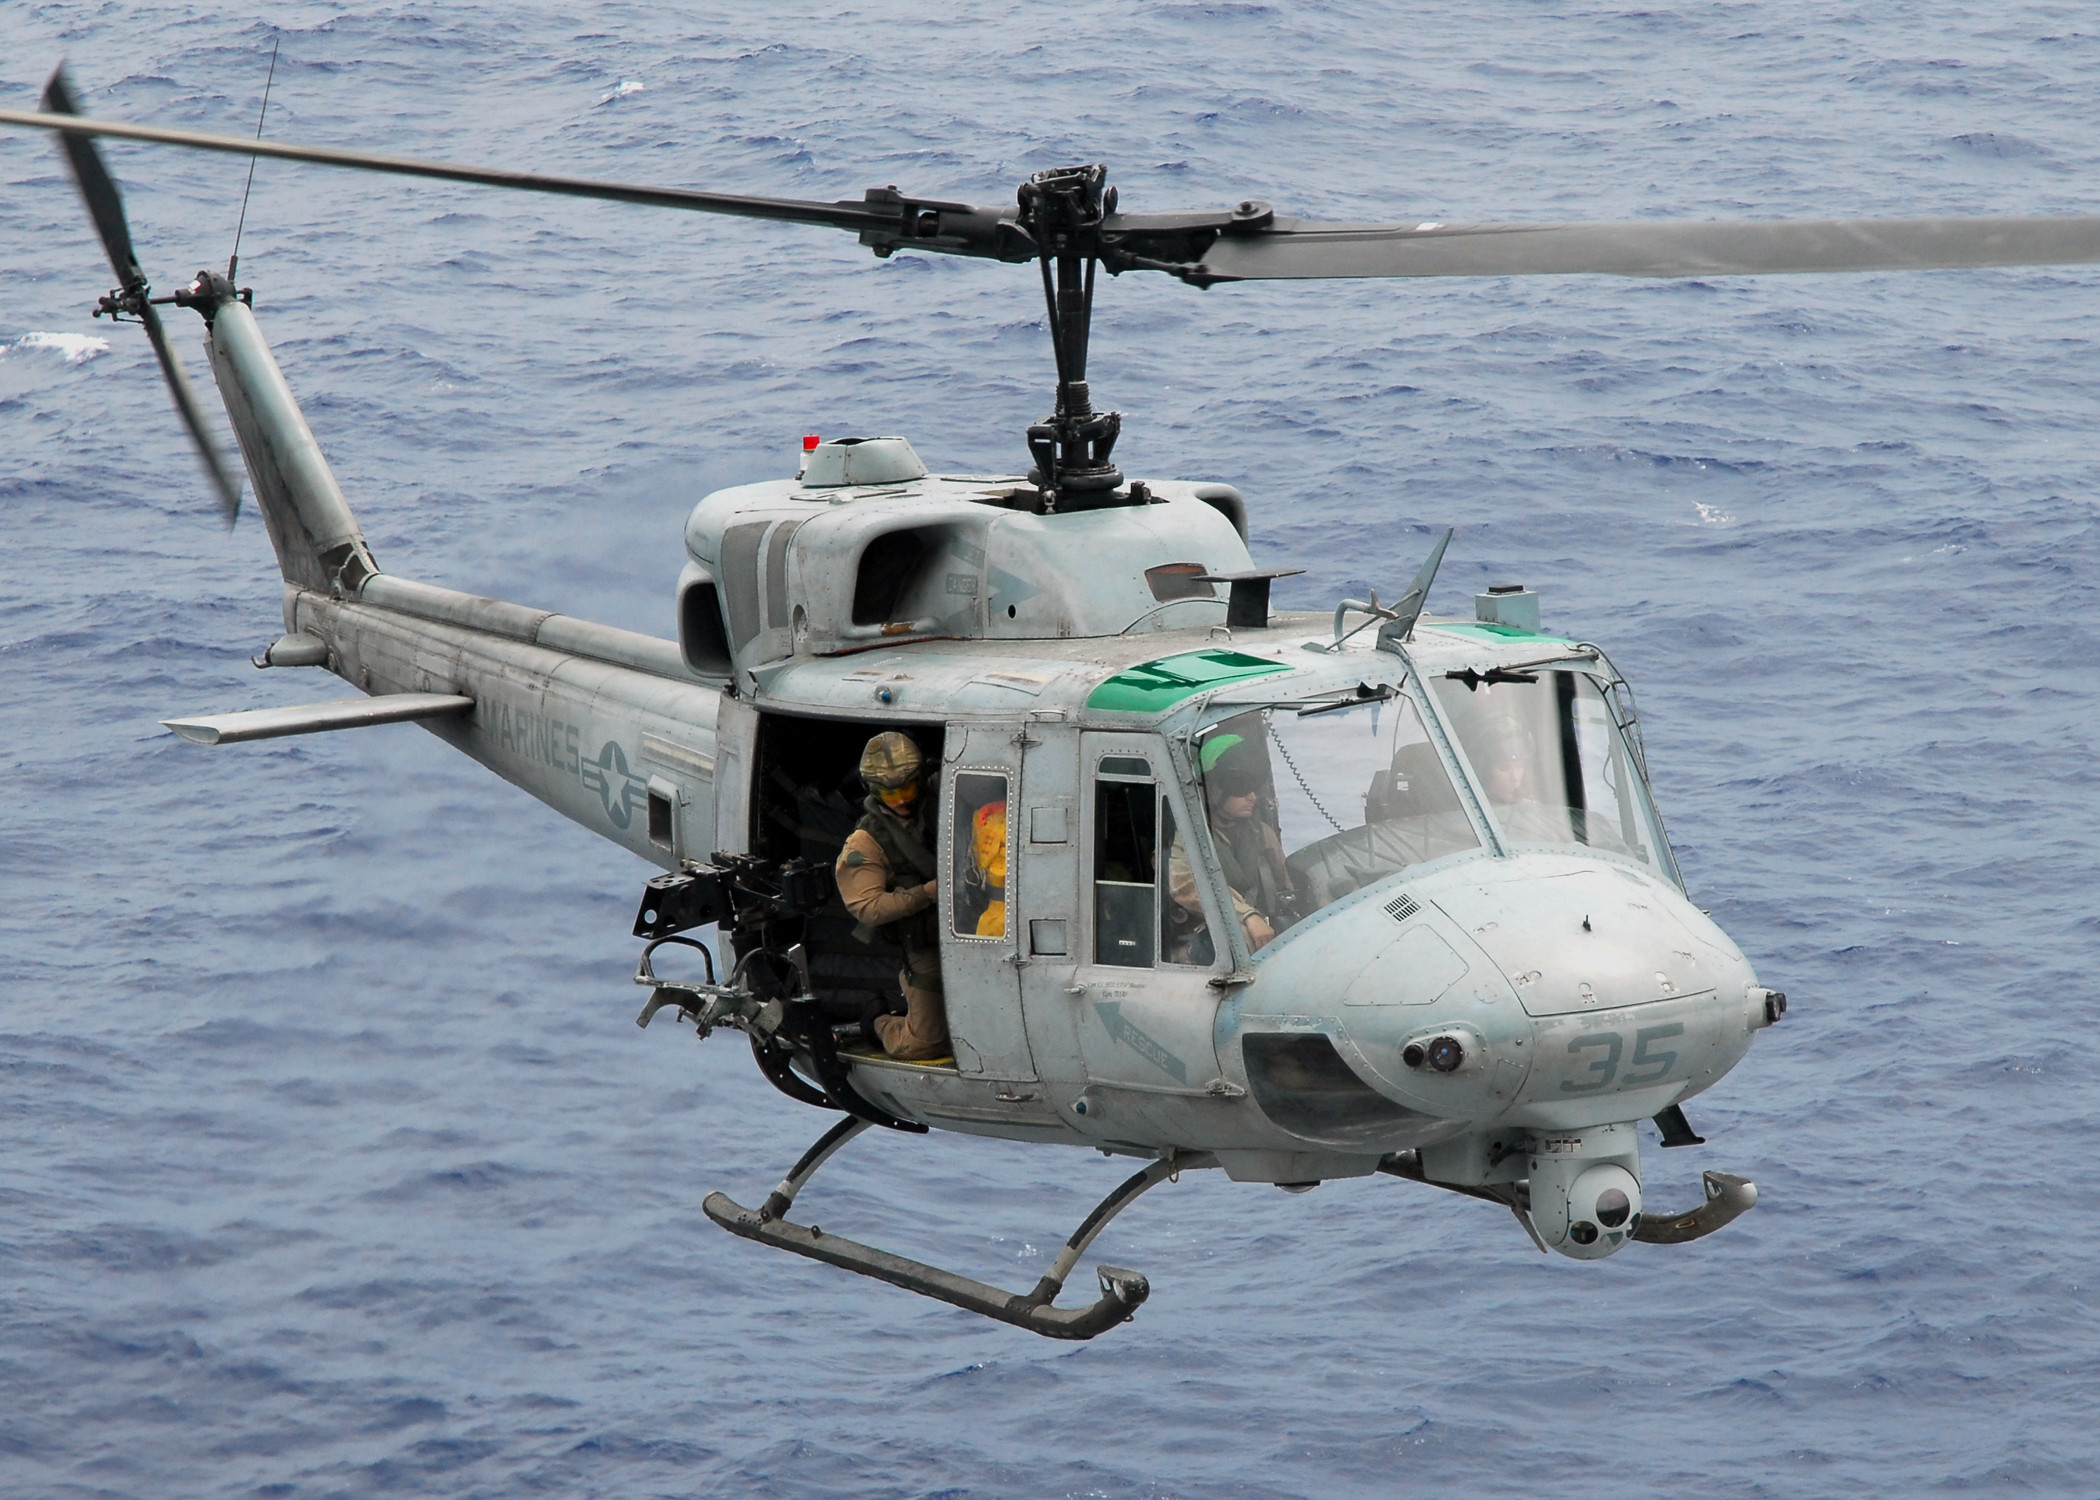 Res: 2100x1500, File:US Navy 081017-N-2183K-014 A UH-1N Twin